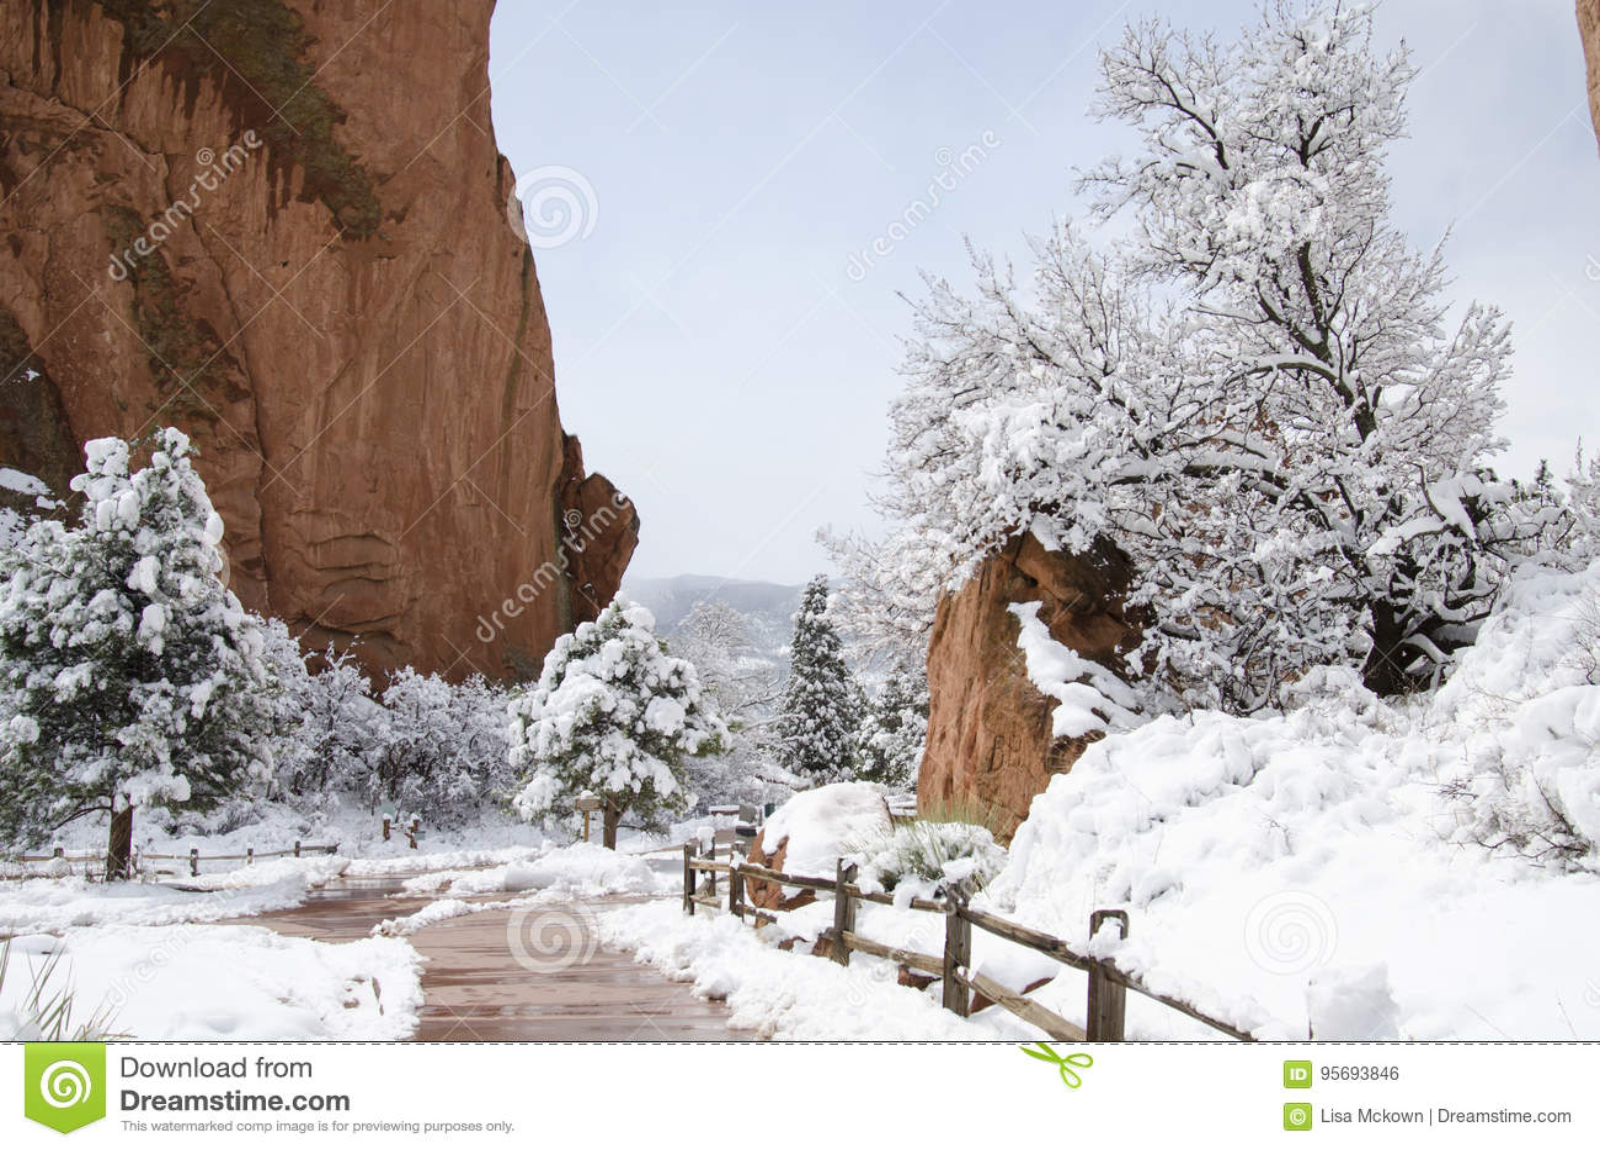 Garden Of The Gods Park In Winter Stock Photo Image Of